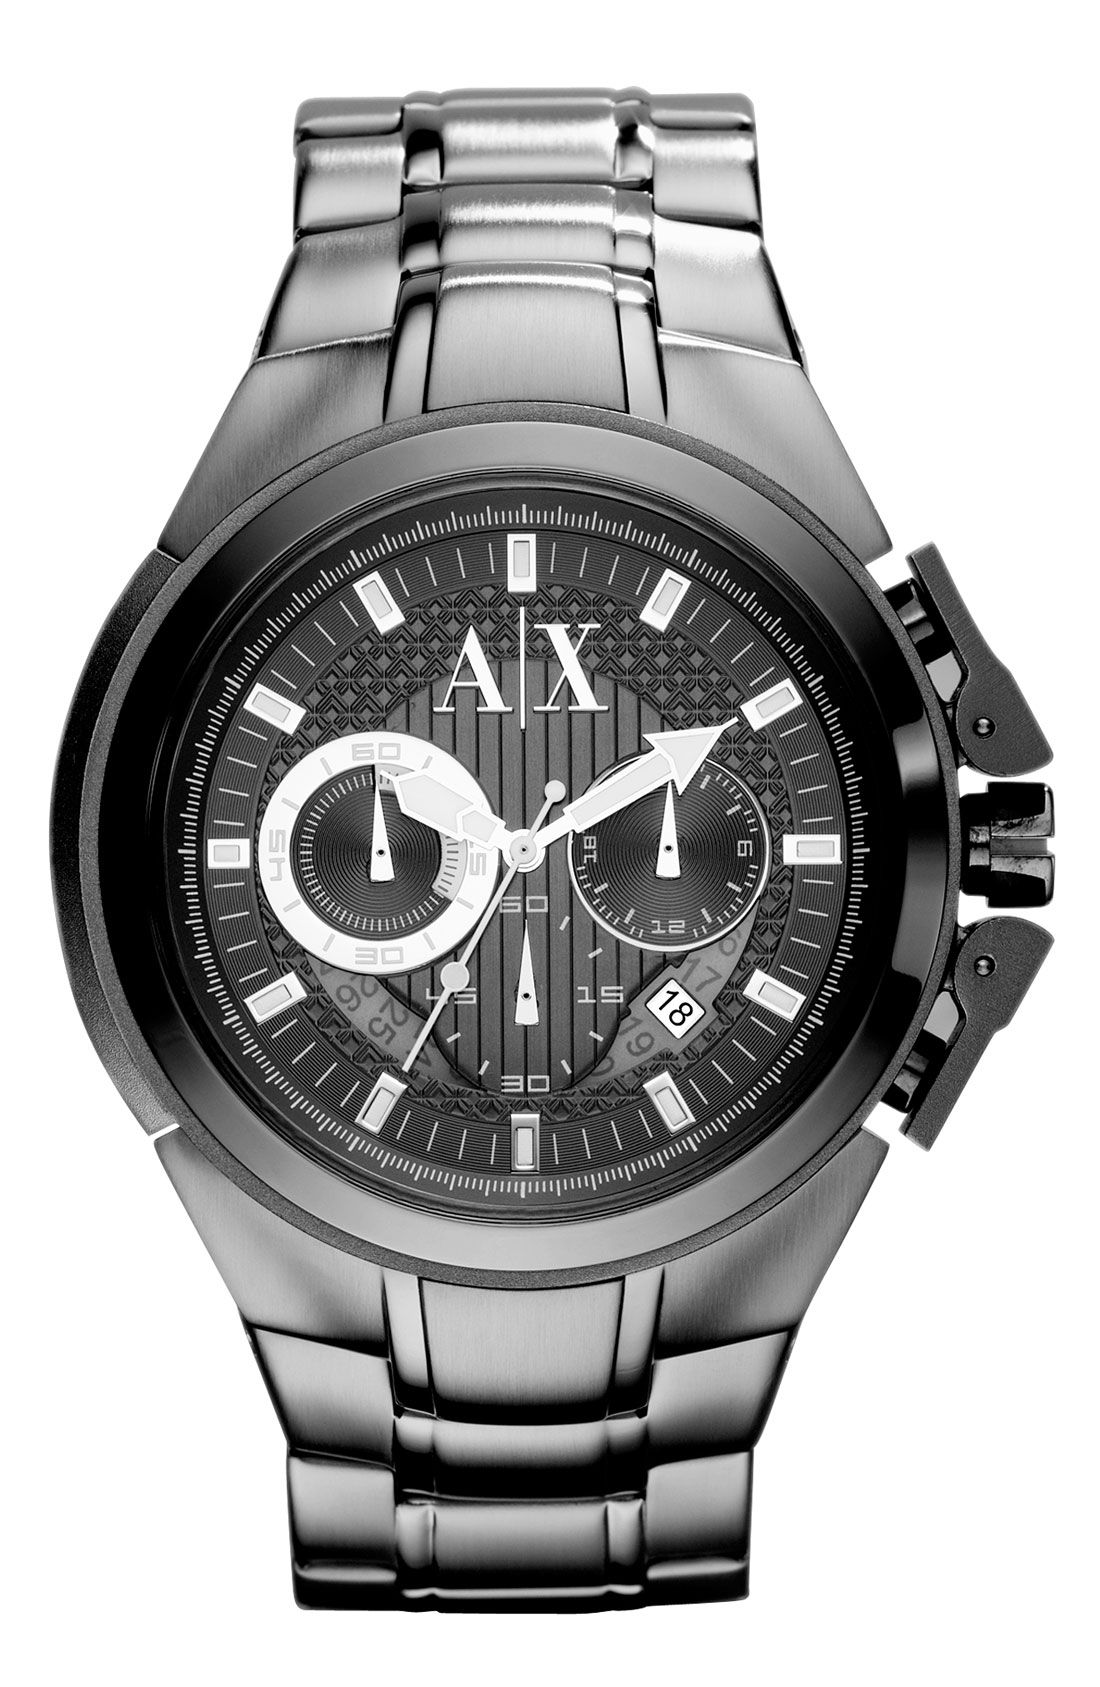 328b8e6612a7f ax-armani-exchange-gunmetal-mens-chronograph-bracelet-watch-product ...